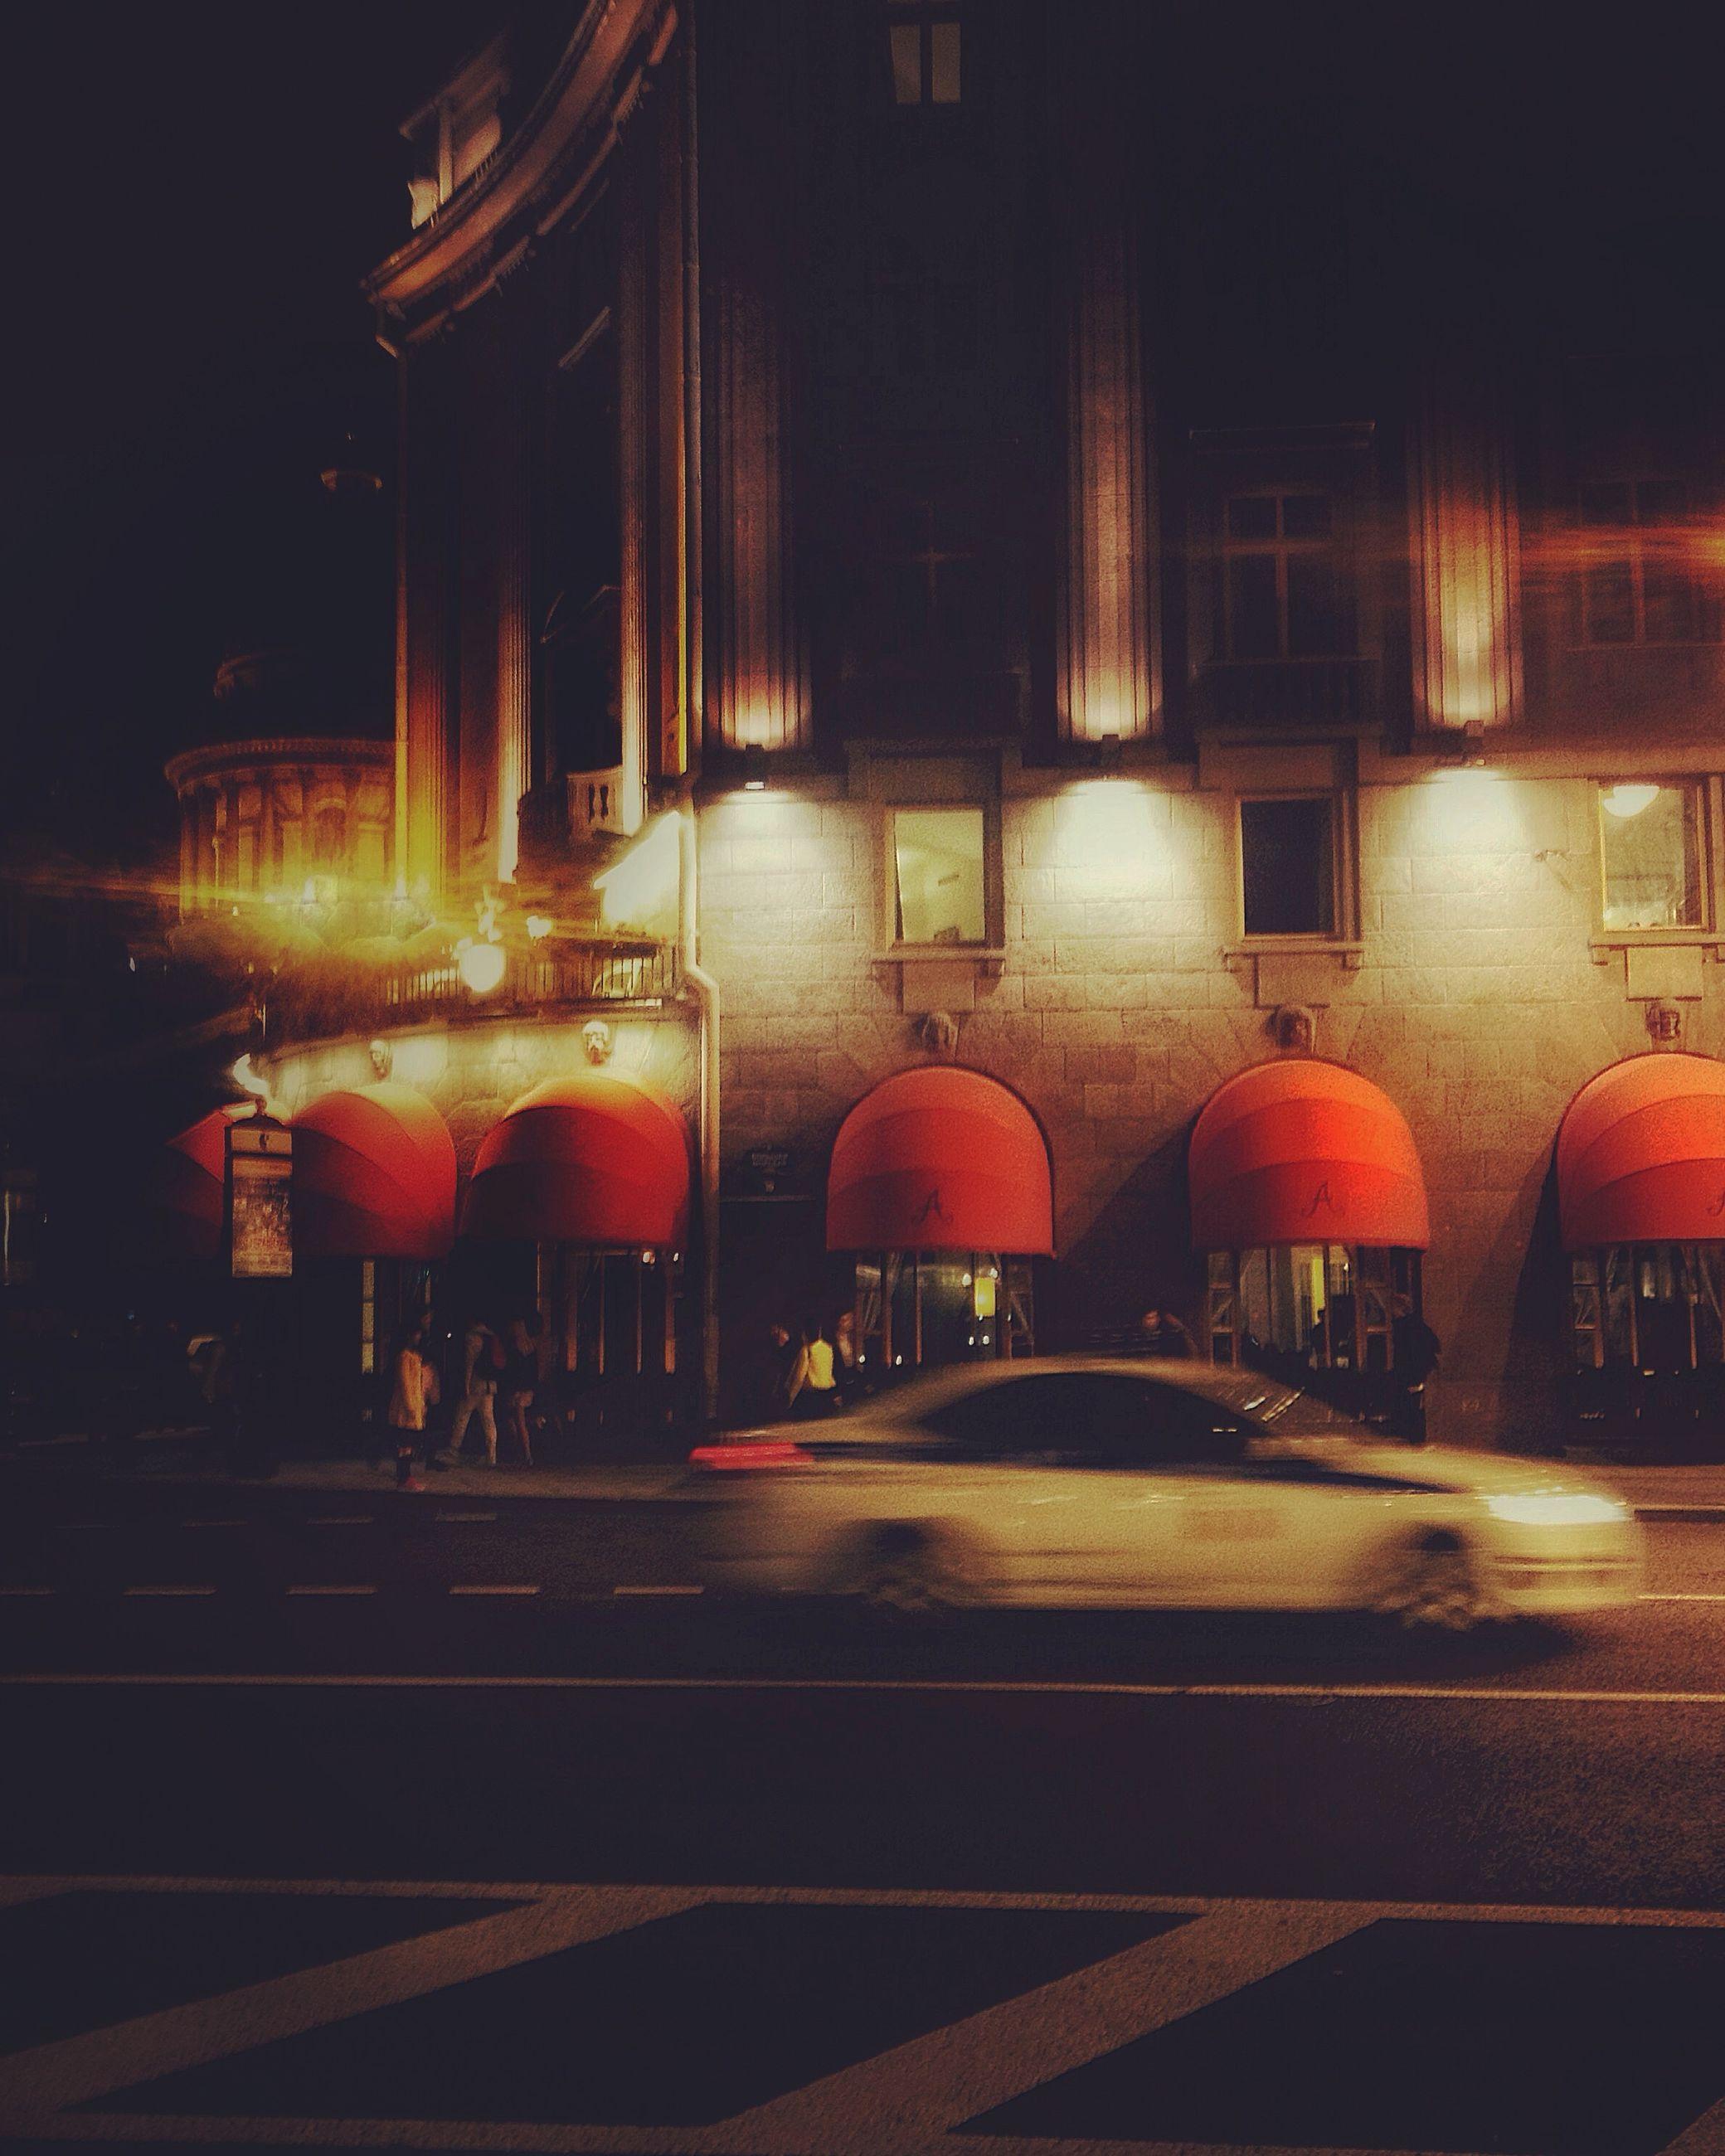 illuminated, night, building exterior, architecture, built structure, street, lighting equipment, city, street light, transportation, red, road, outdoors, light - natural phenomenon, no people, sidewalk, incidental people, city life, car, city street